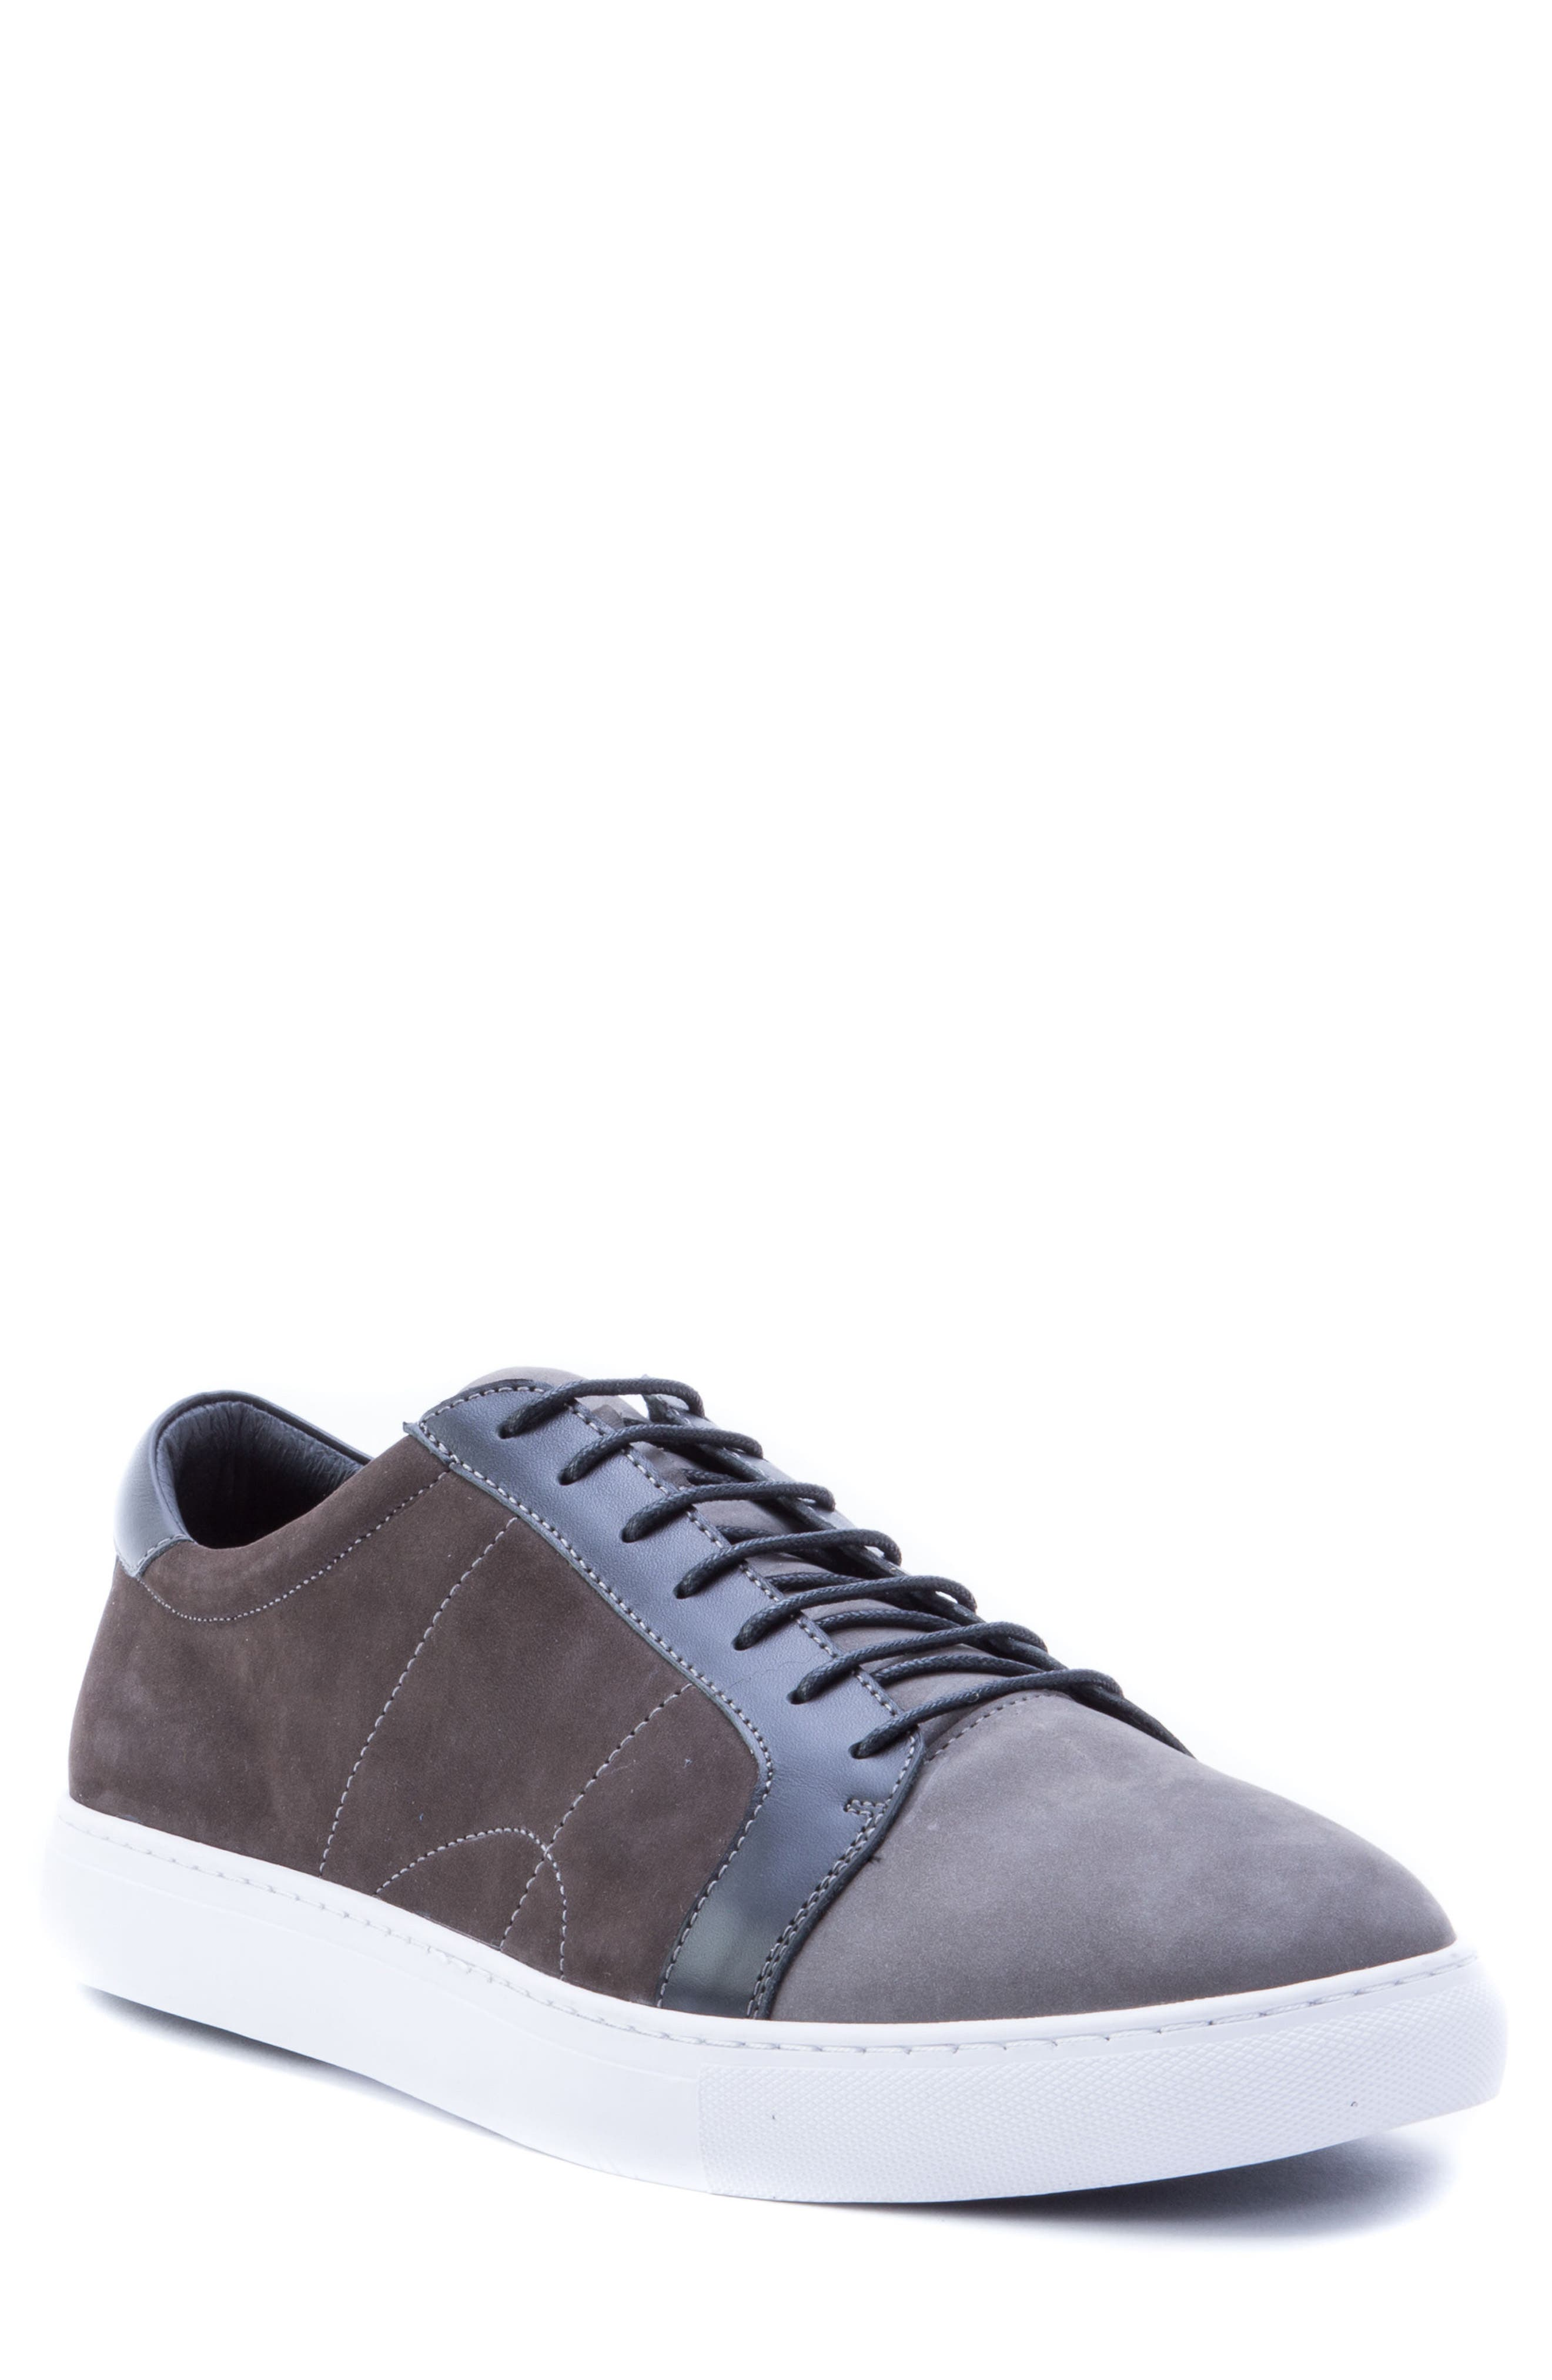 Gonzalo Low Top Sneaker, Main, color, GREY SUEDE